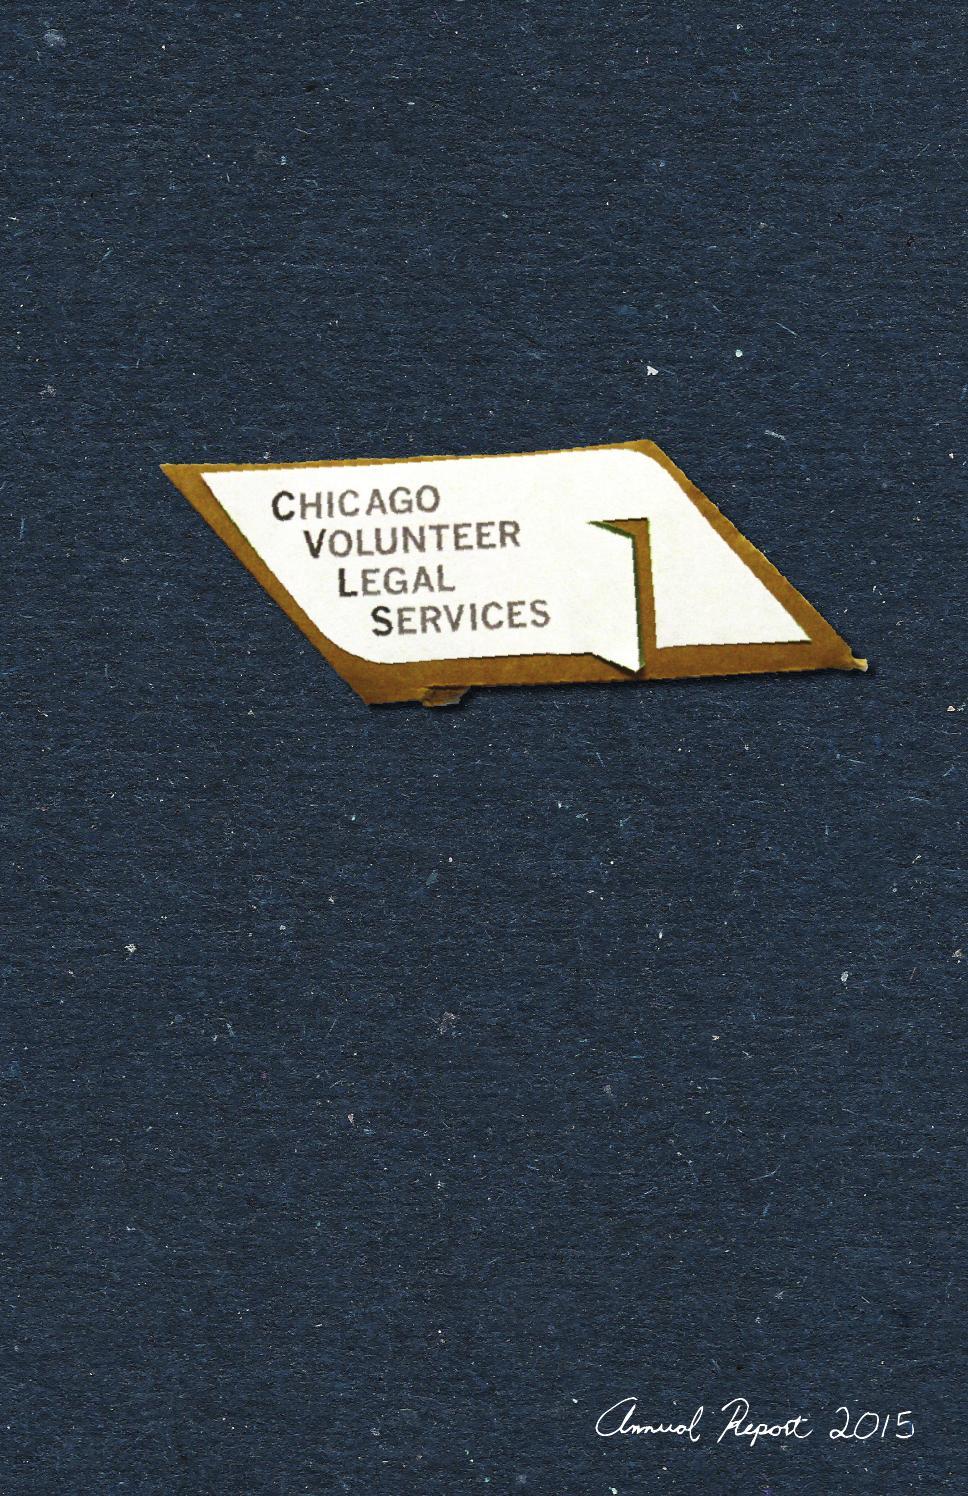 chicago volunteer legal services 2015 annual report by chicago chicago volunteer legal services 2015 annual report by chicago volunteer legal services issuu